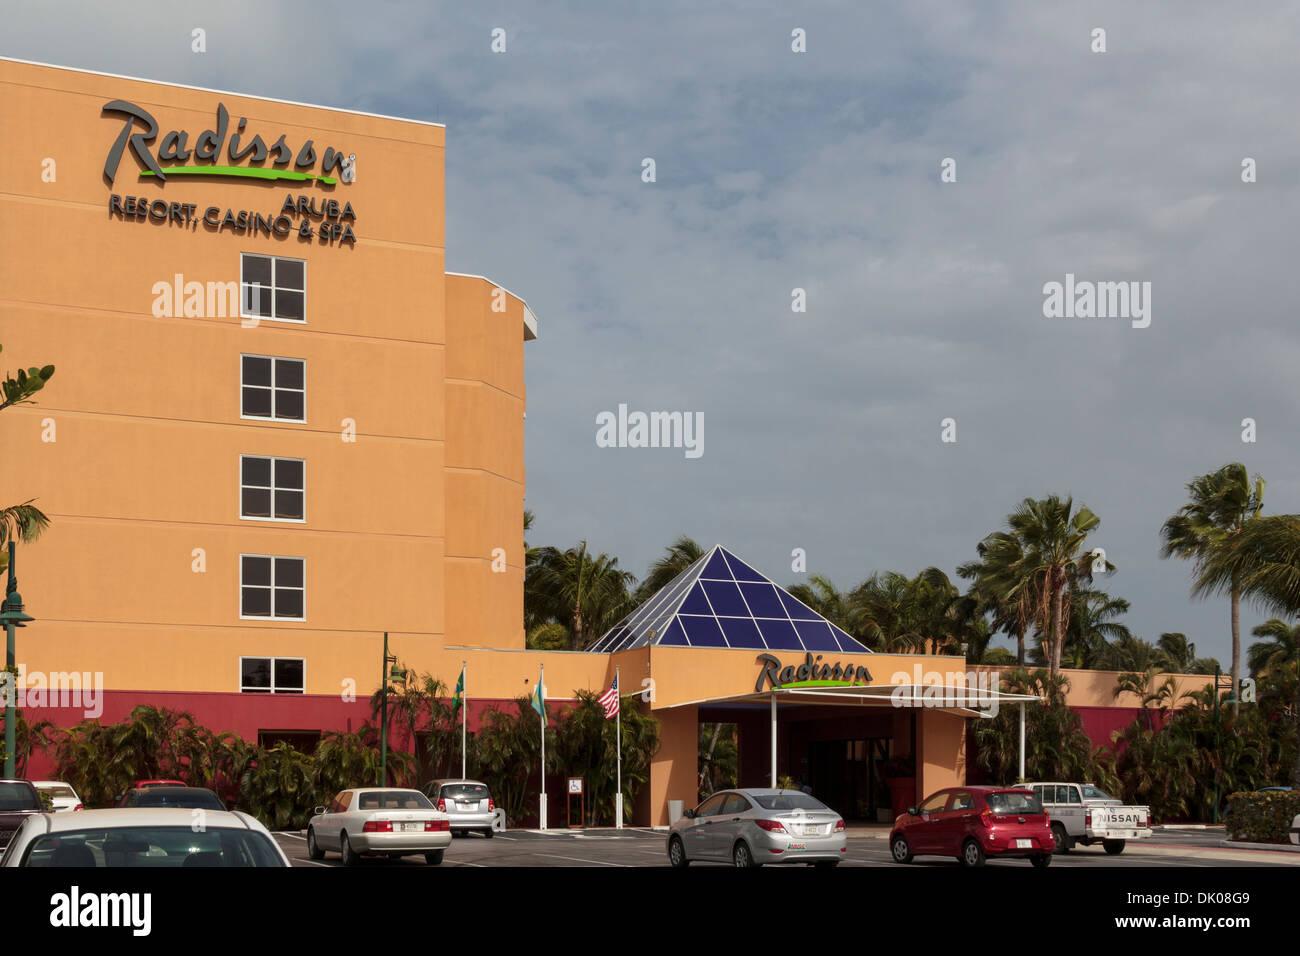 radisson aruba resort casino & spa entrance and parking lot from